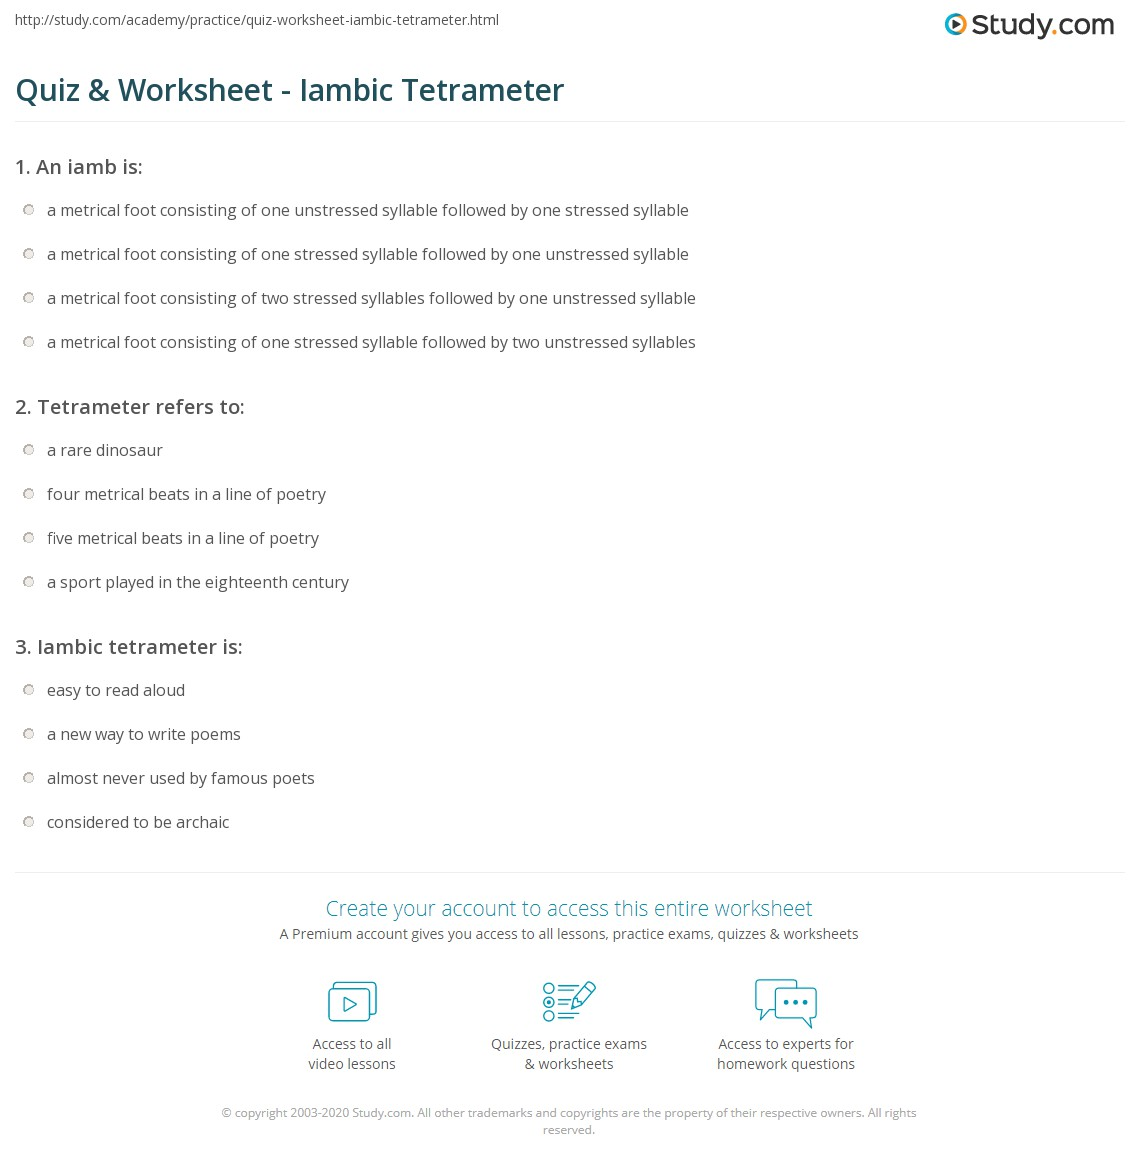 Quiz Worksheet Iambic Tetrameter Study